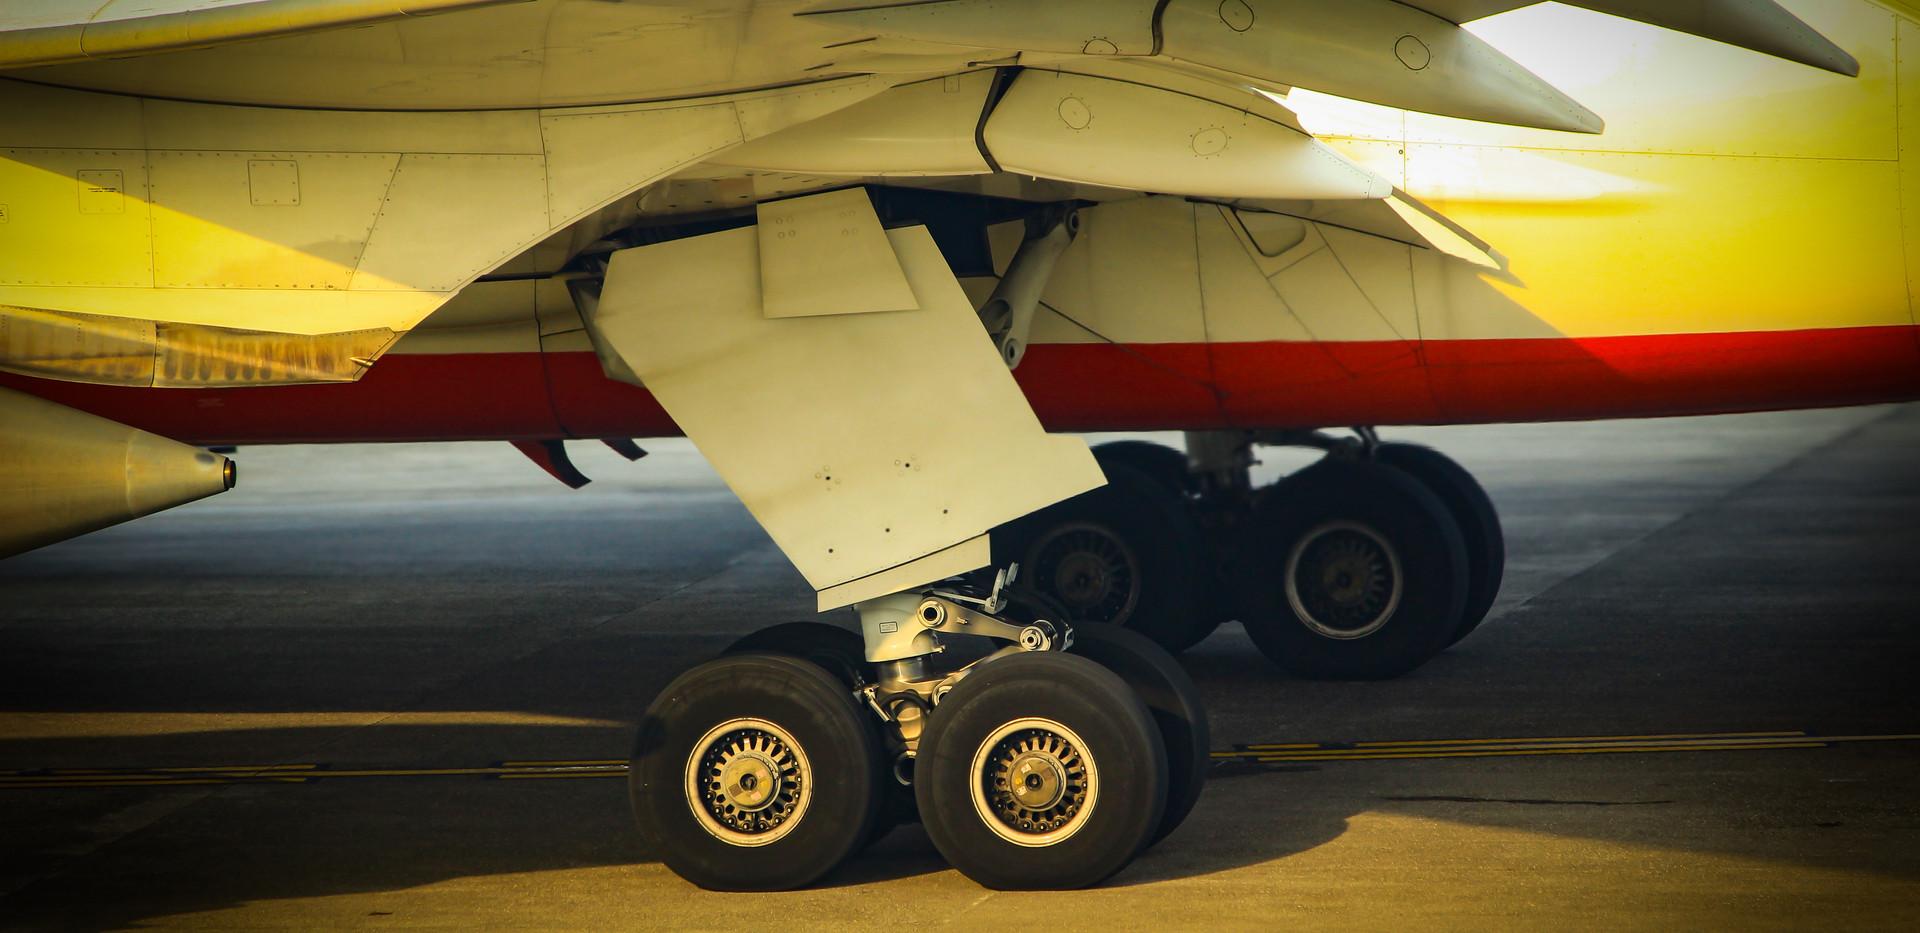 Dreamliner Main Landing Gear